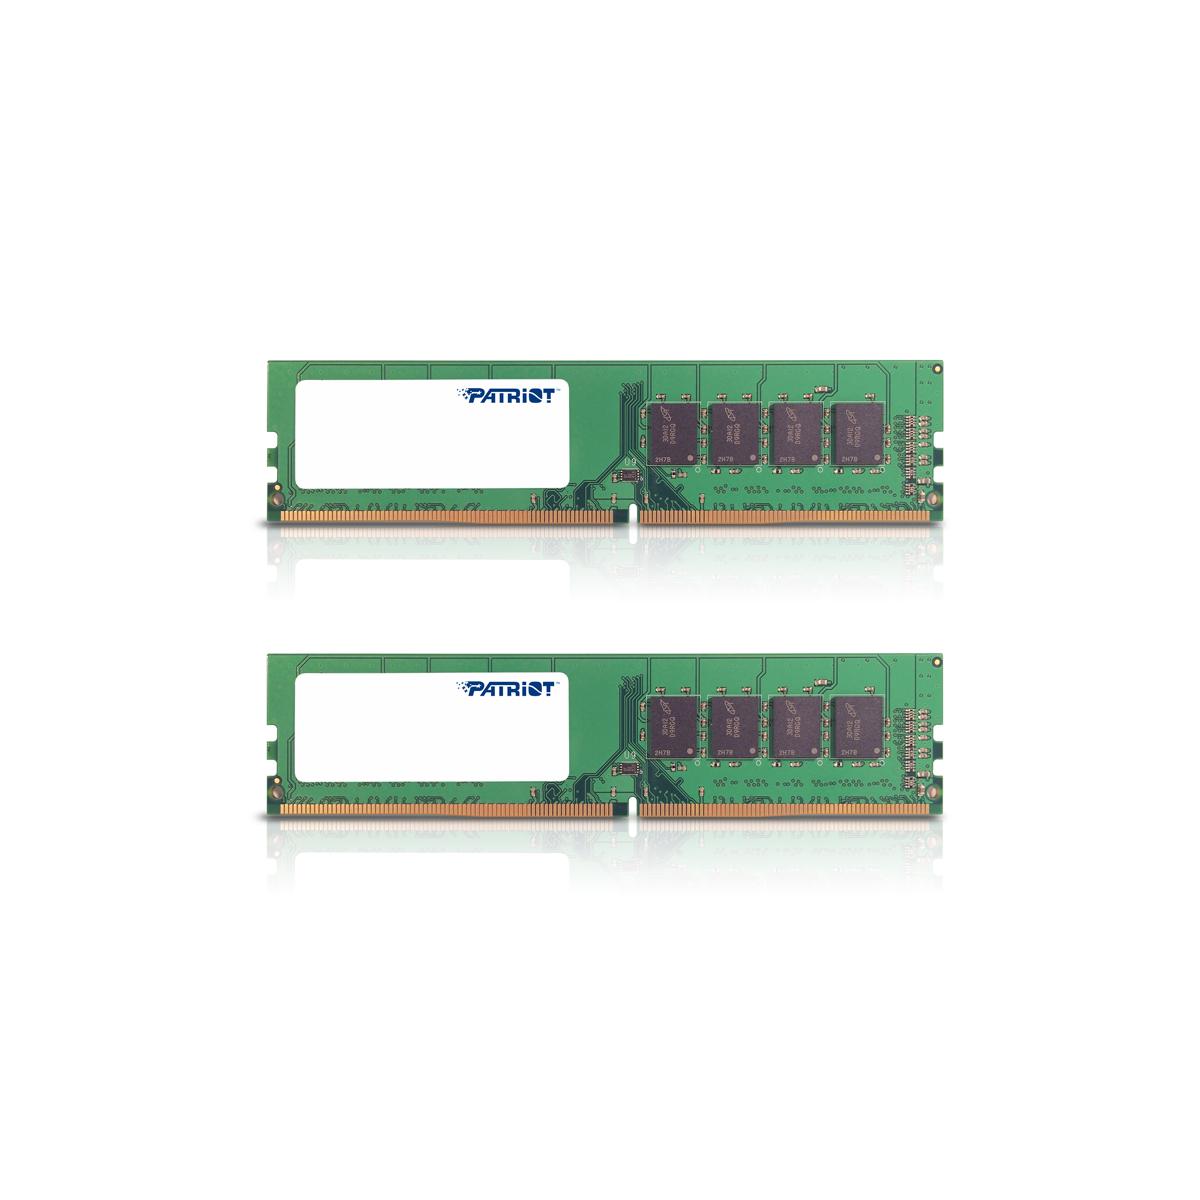 32GB DDR4-2133MHz Patriot CL15, kit 2x16GB